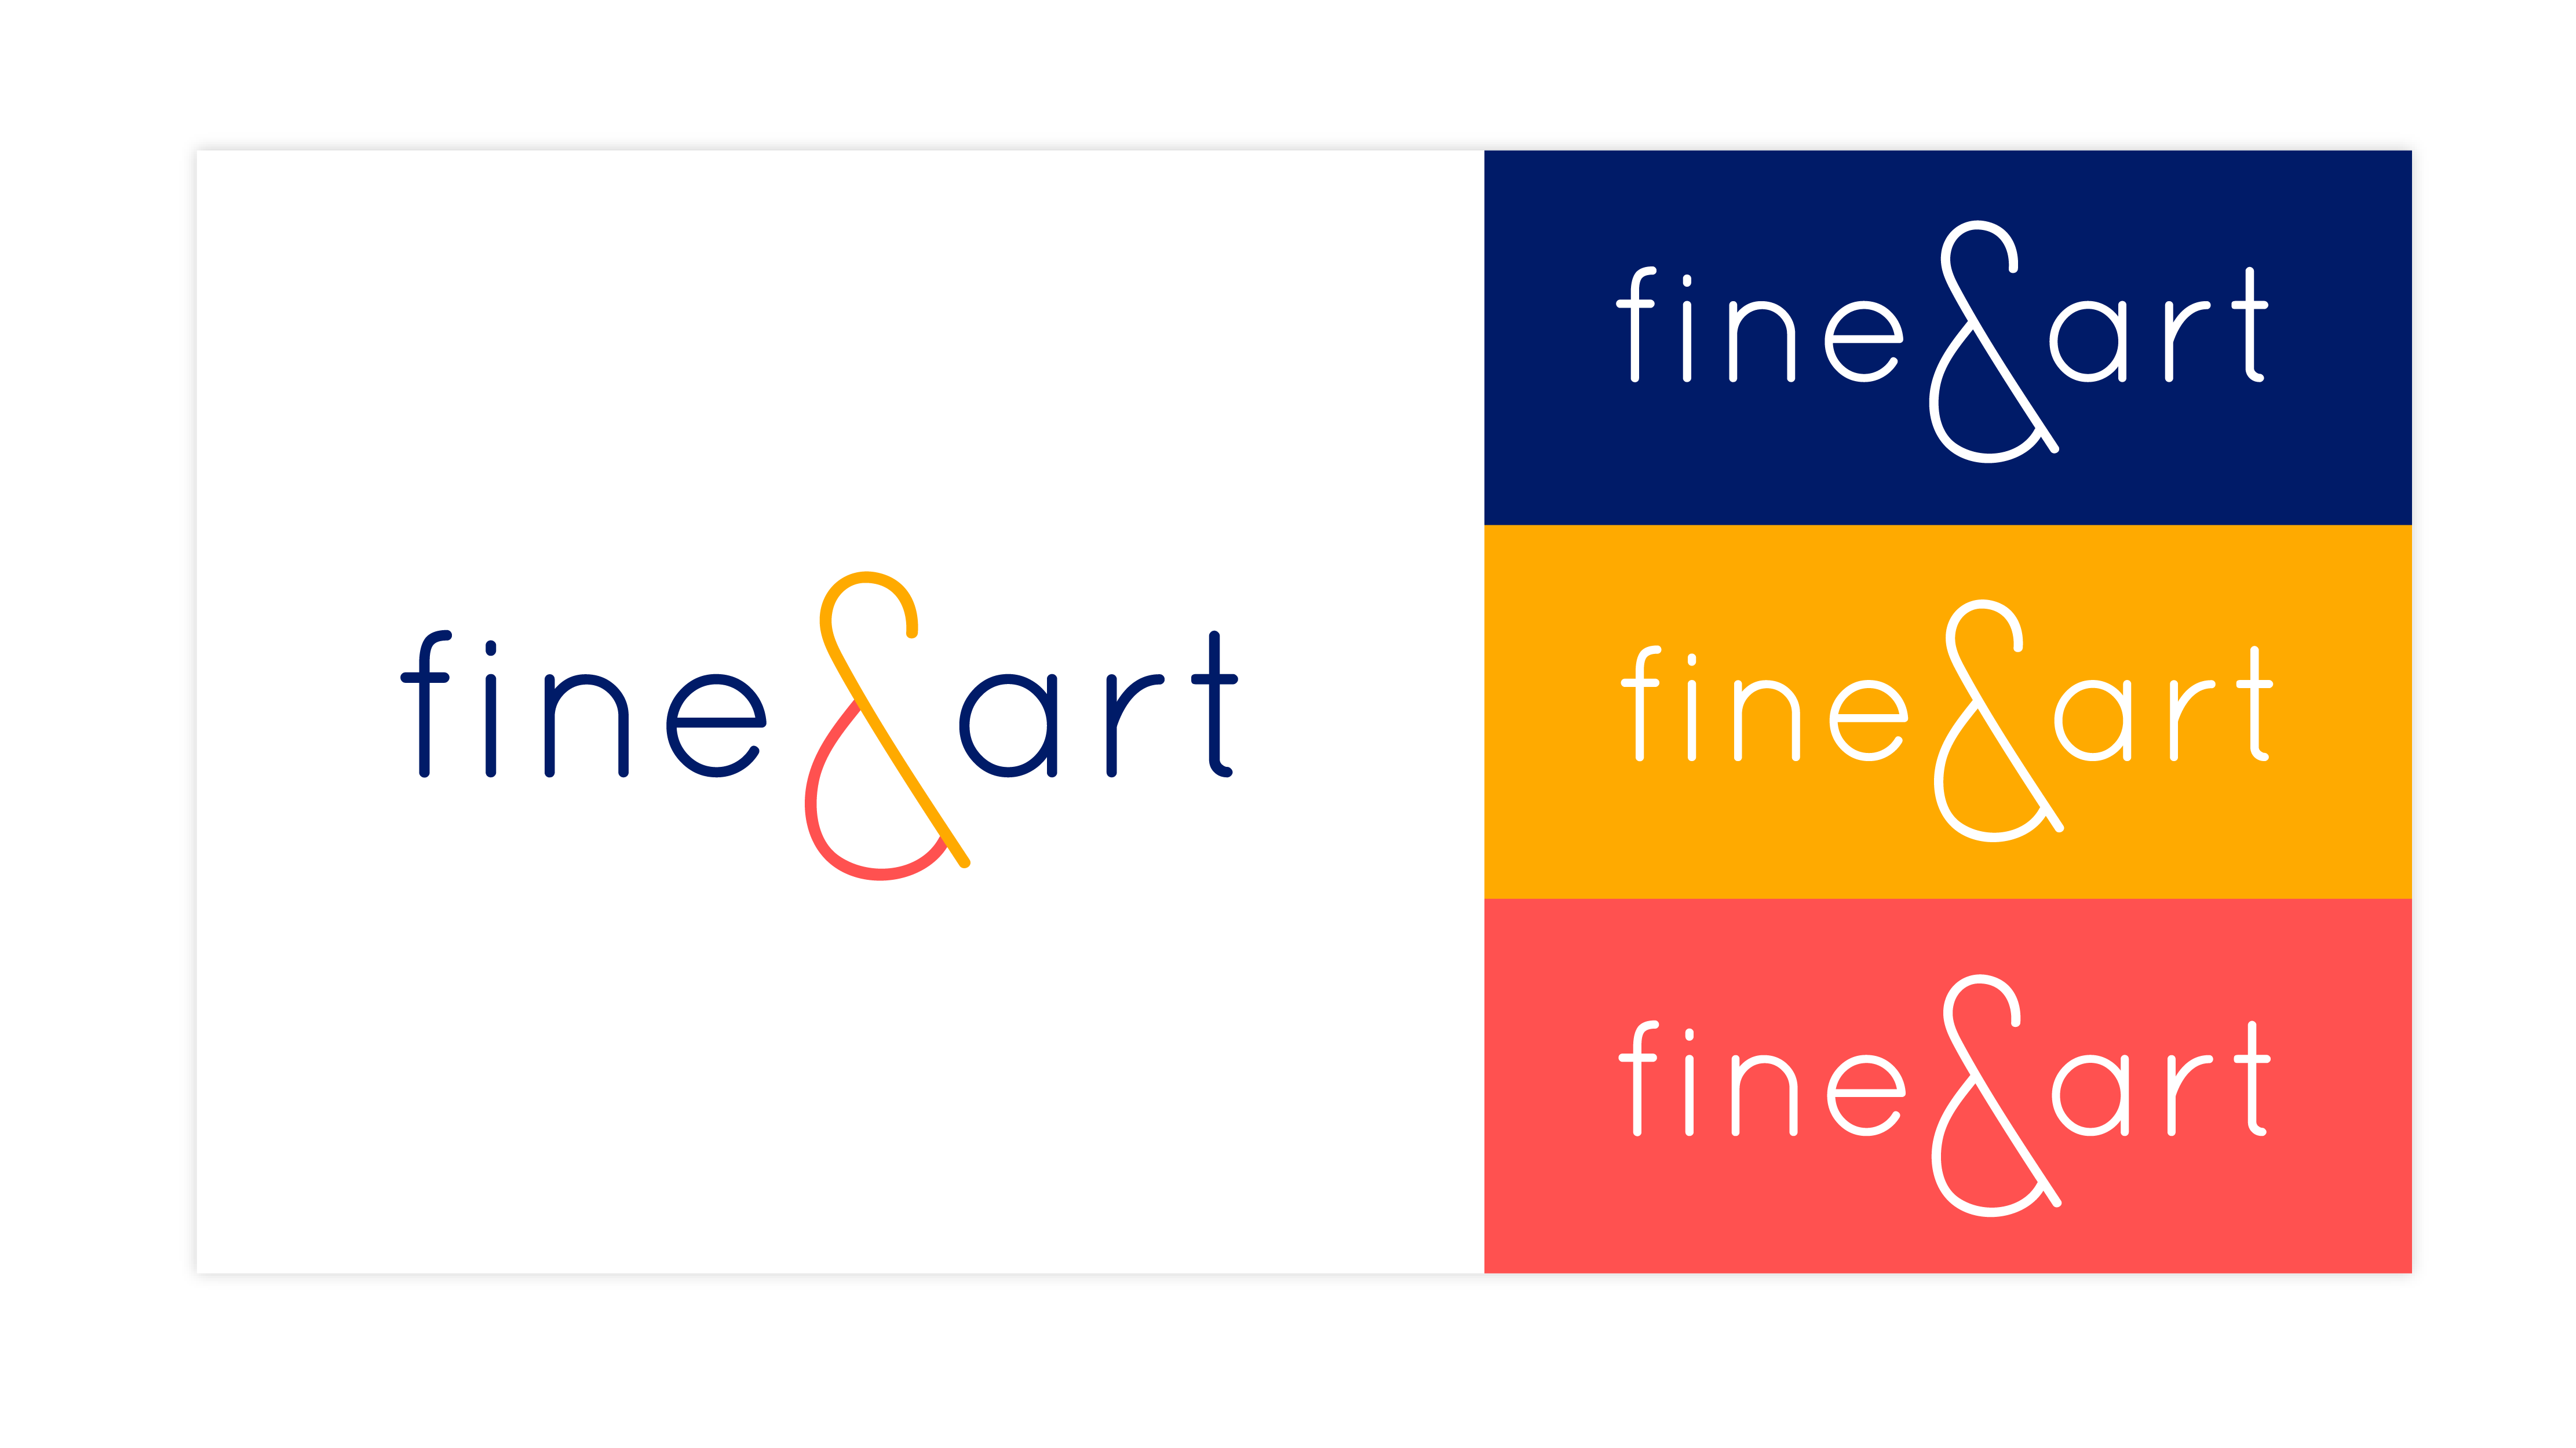 fine&art-02